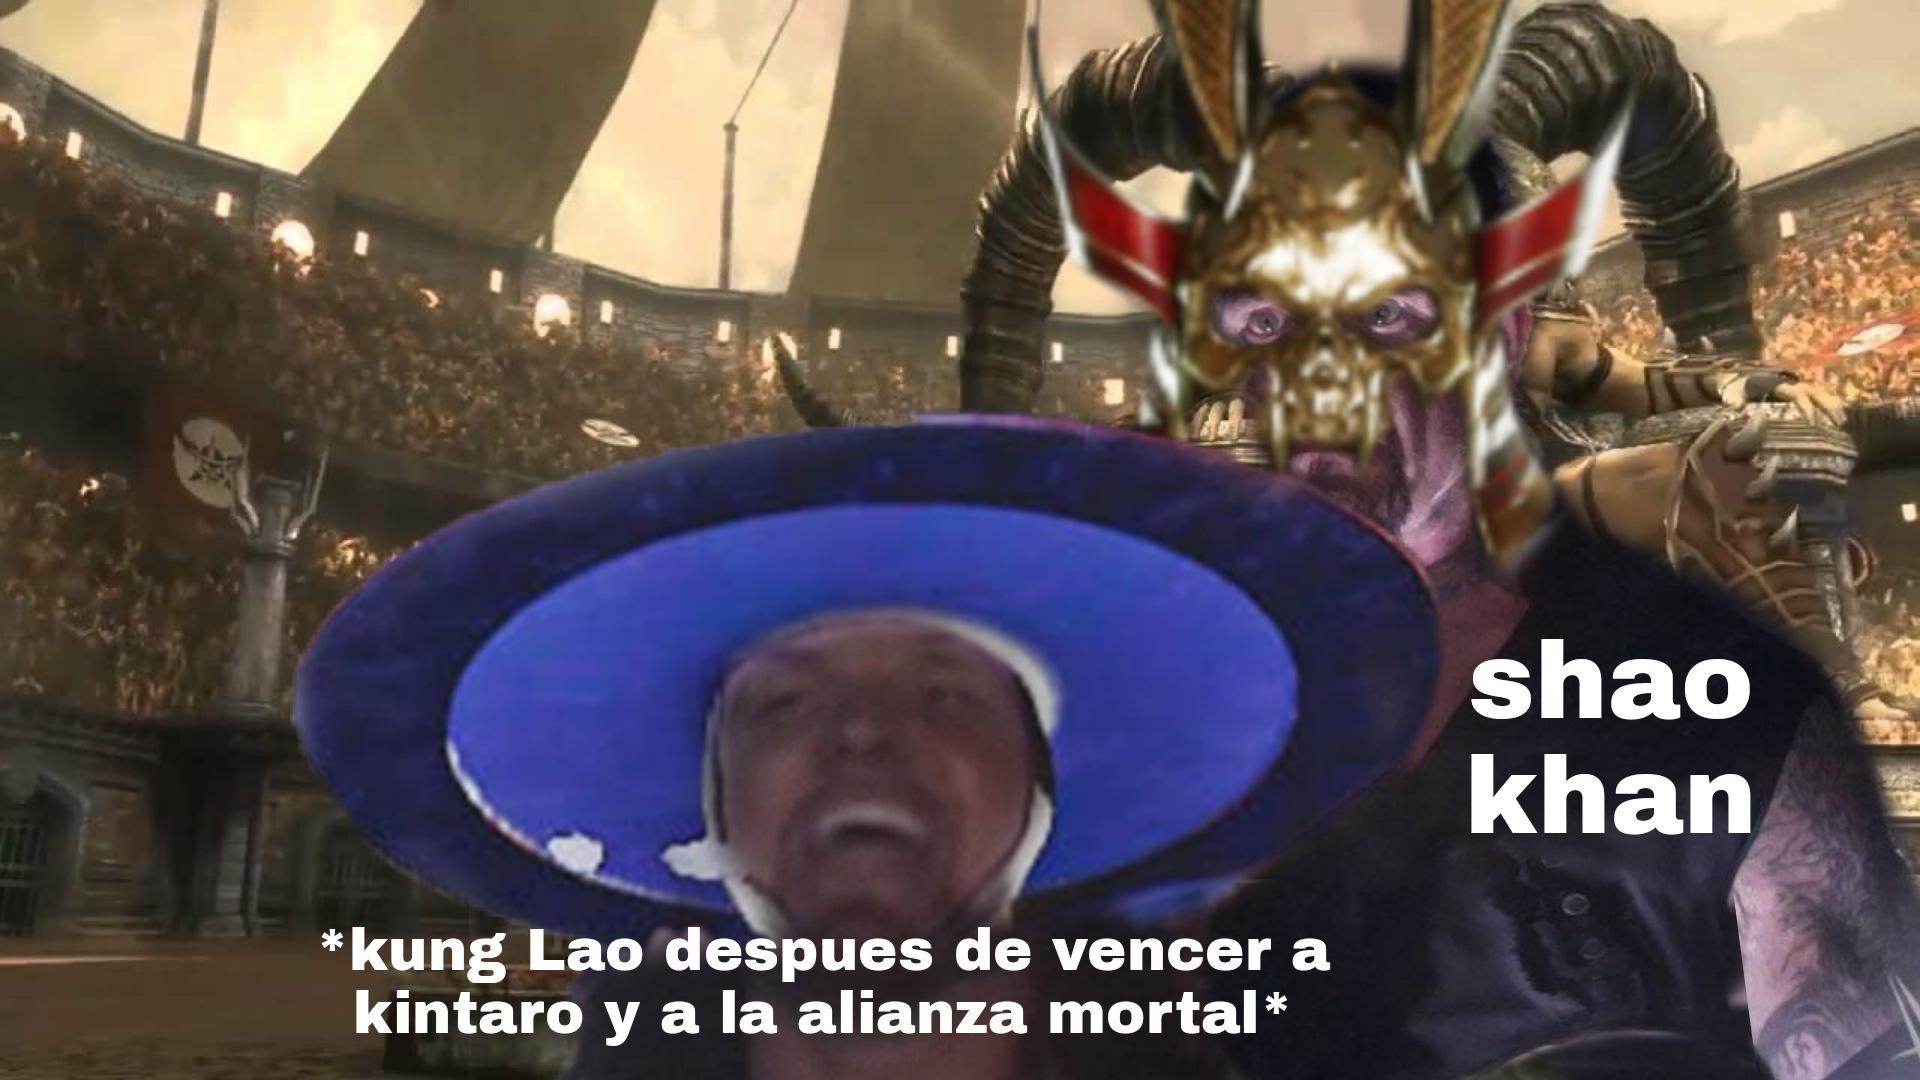 Edición is my pasion - meme